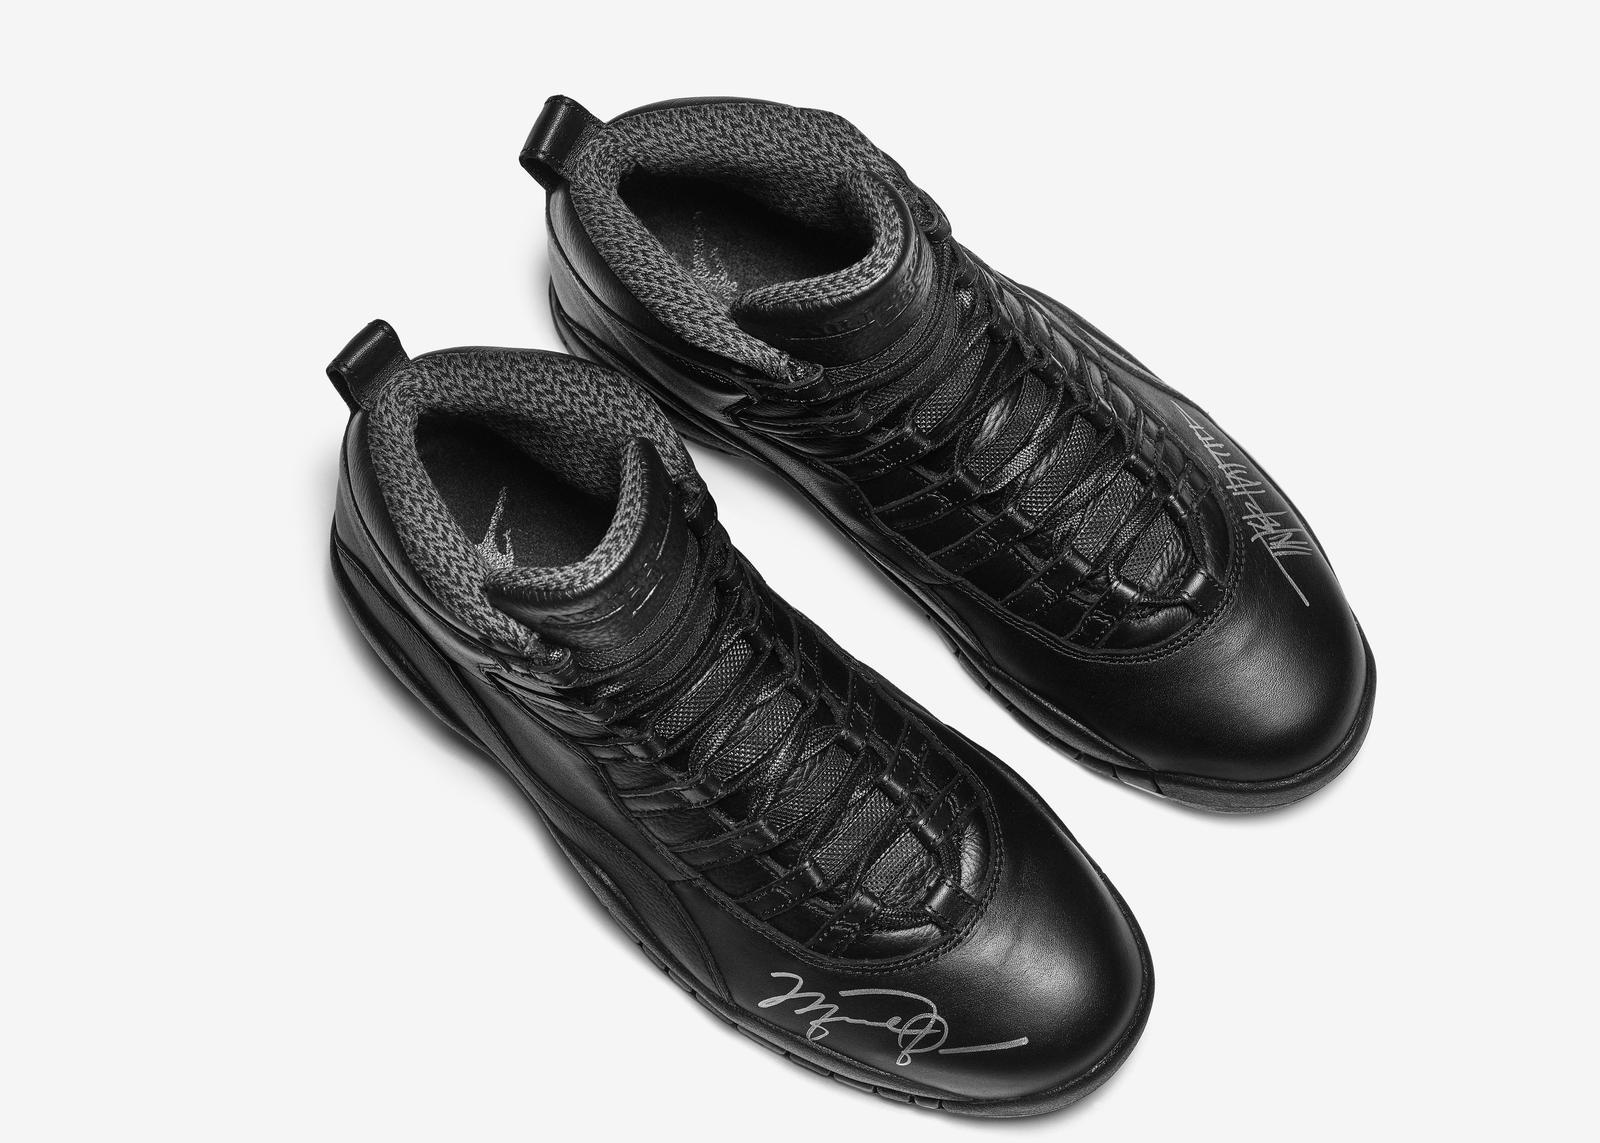 Nike jordan x auction m sz10 top rectangle 1600